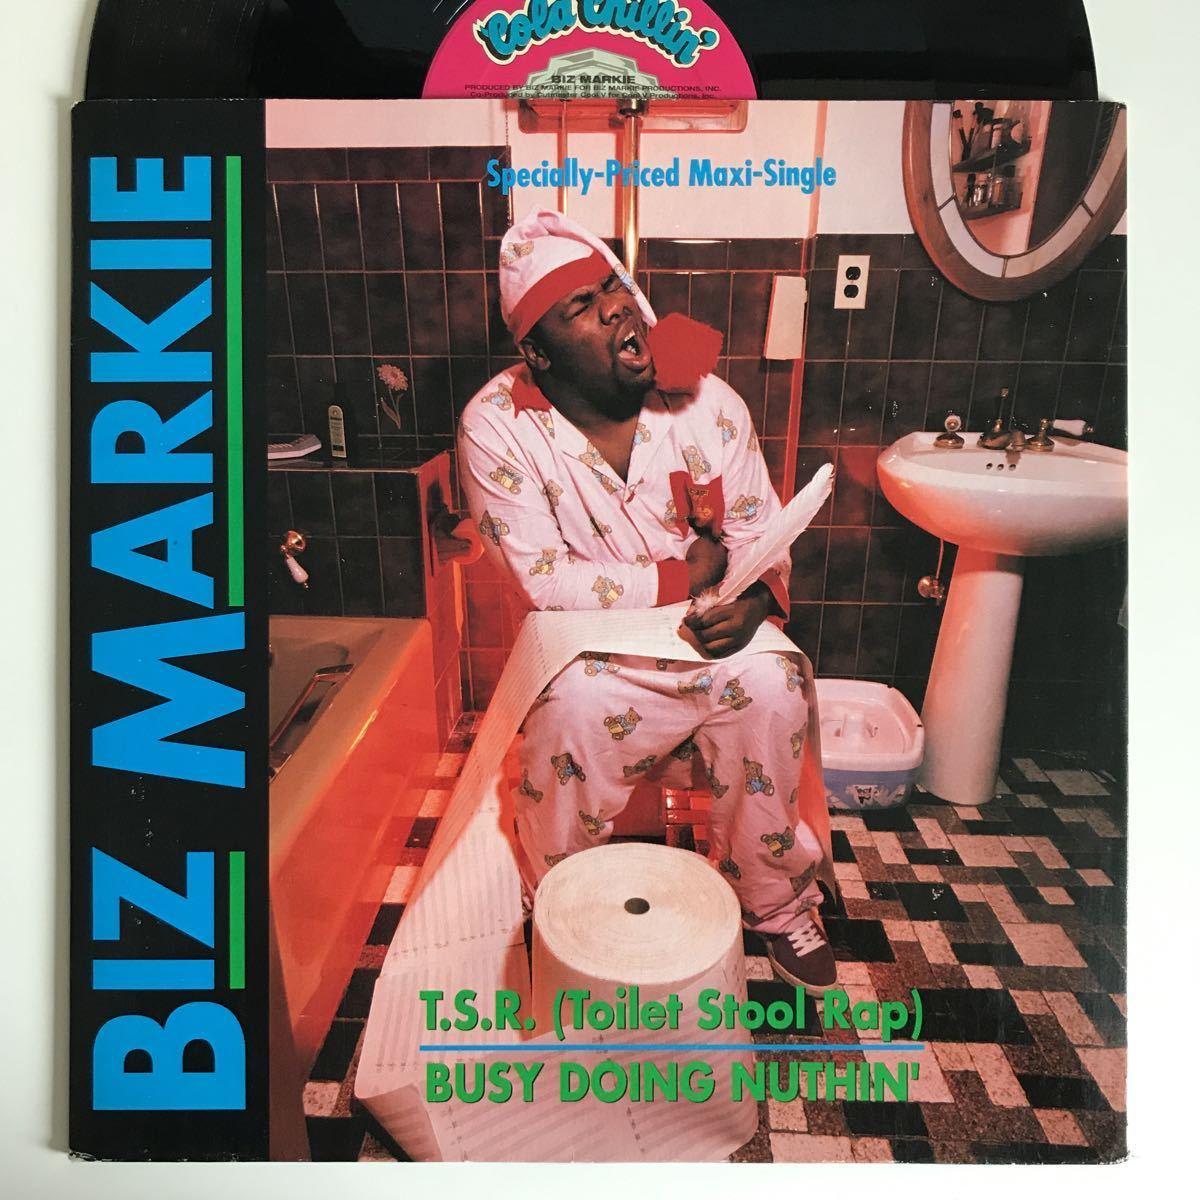 Biz Markie - T.S.R. (Toilet Stool Rap) / Busy Doing Nuthin'【US Orig.】【オリジナル】_画像1